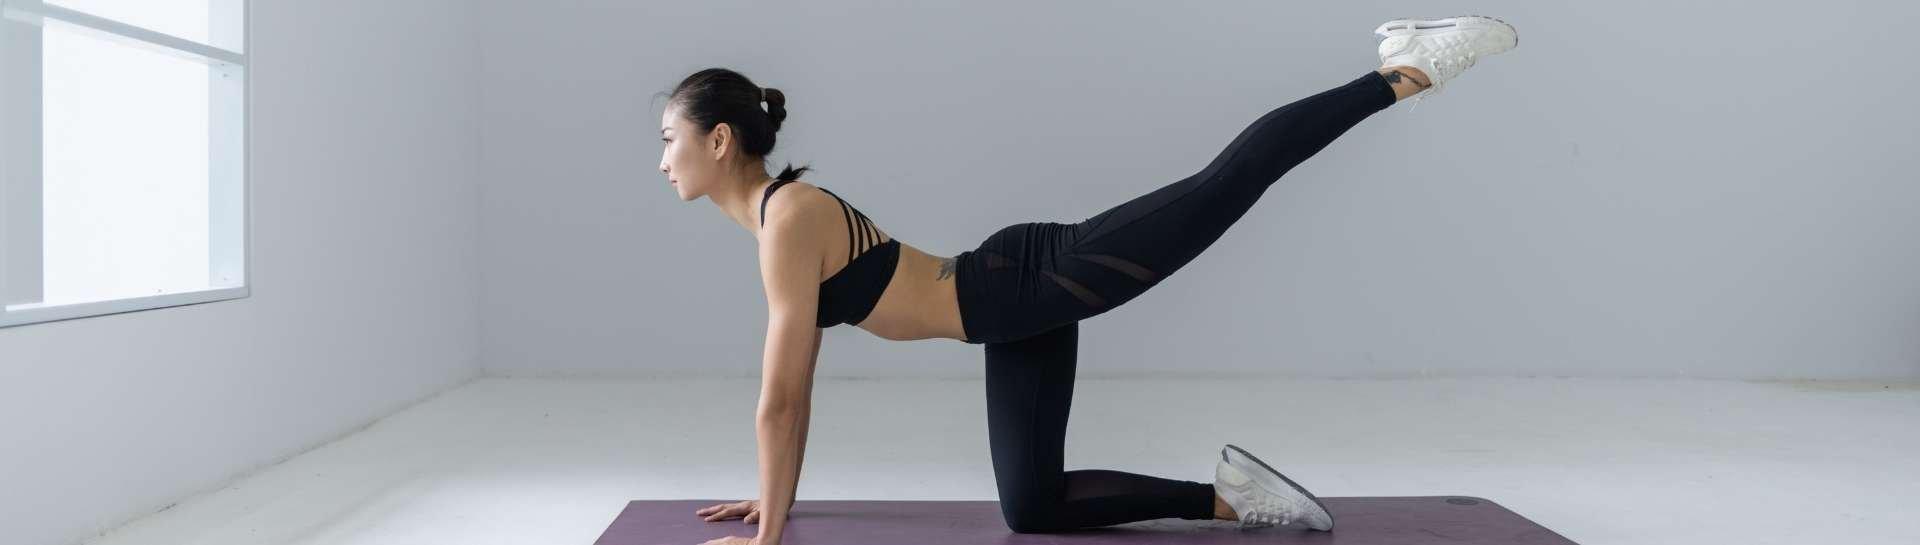 Il Metodo Pilates Spiegato In Breve